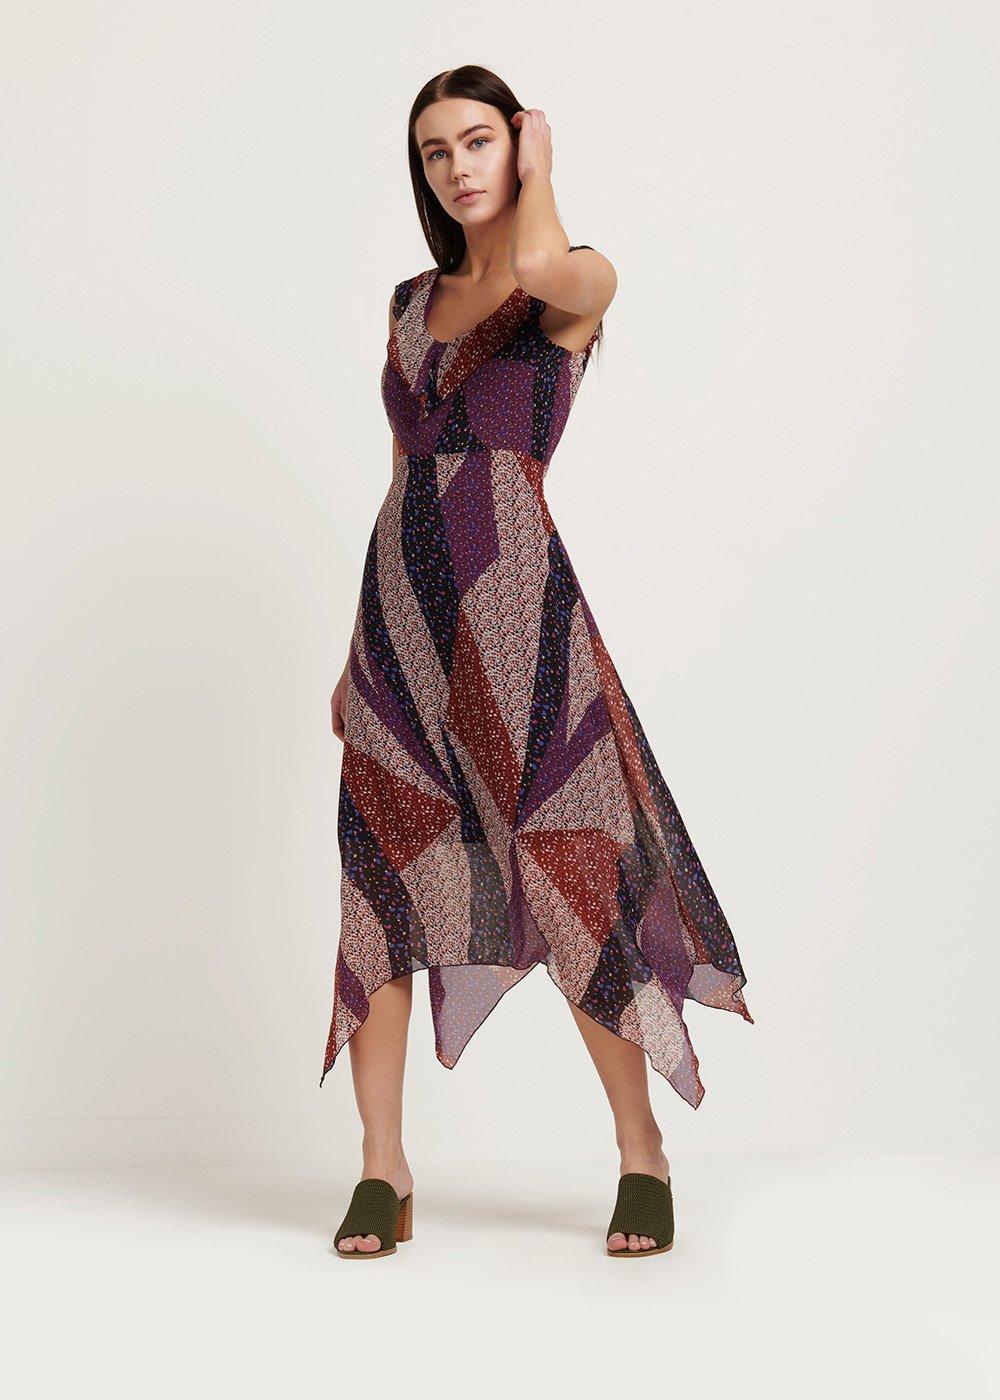 Aris dress with frills - Black / Cannella / Fantasia - Woman